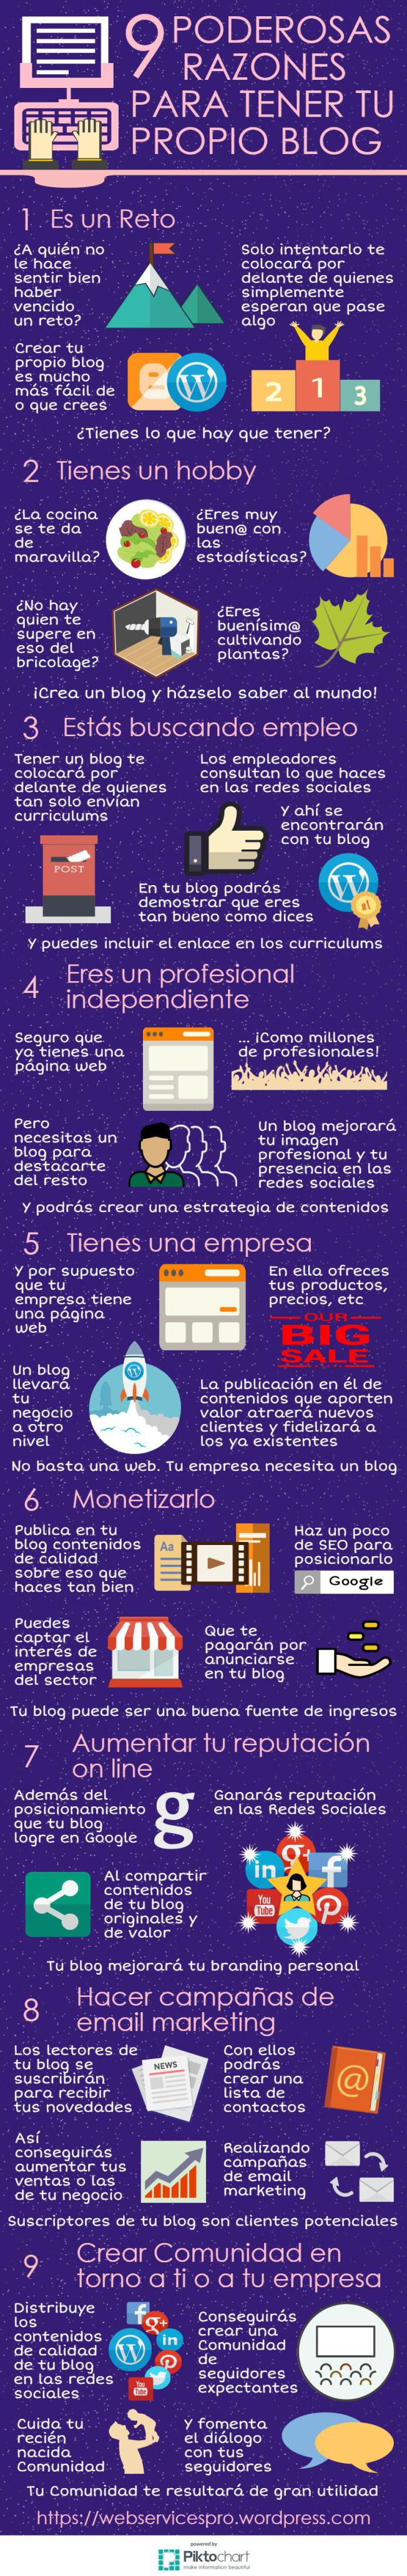 9 Poderosas razones para tener tu propio blog